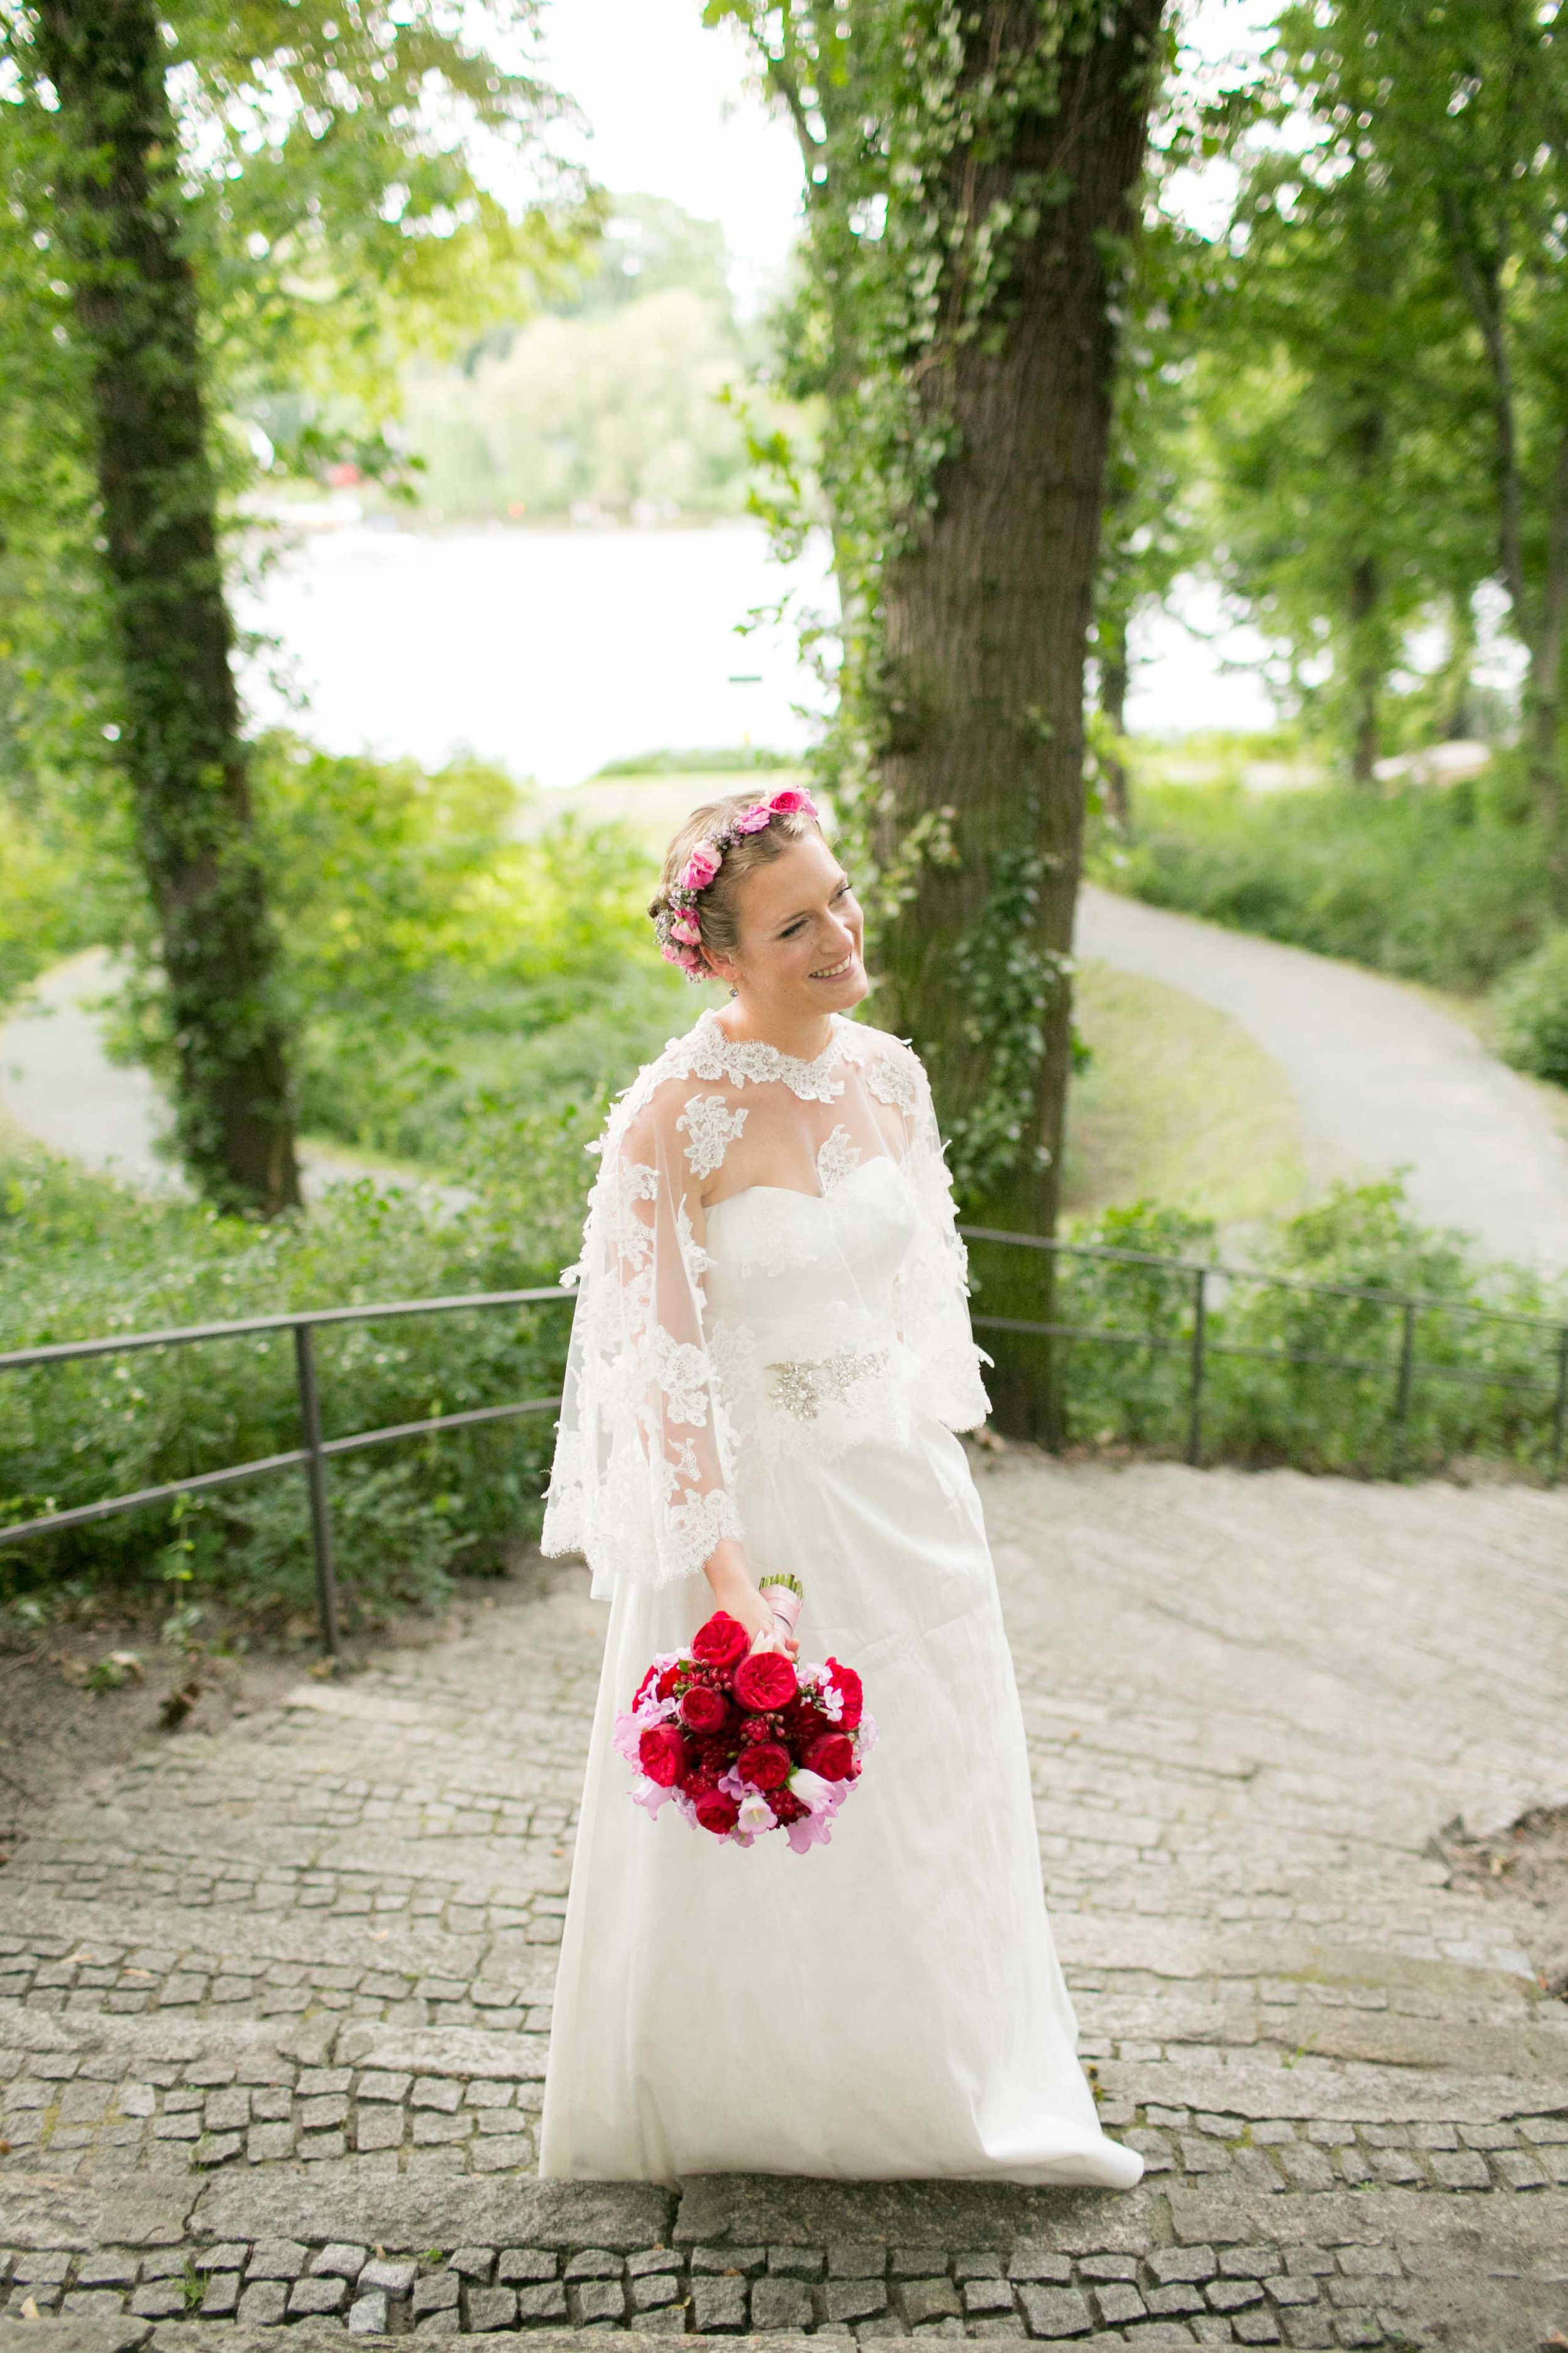 Fran Burrows Berlin Hochzeitsfotografie-58.jpg